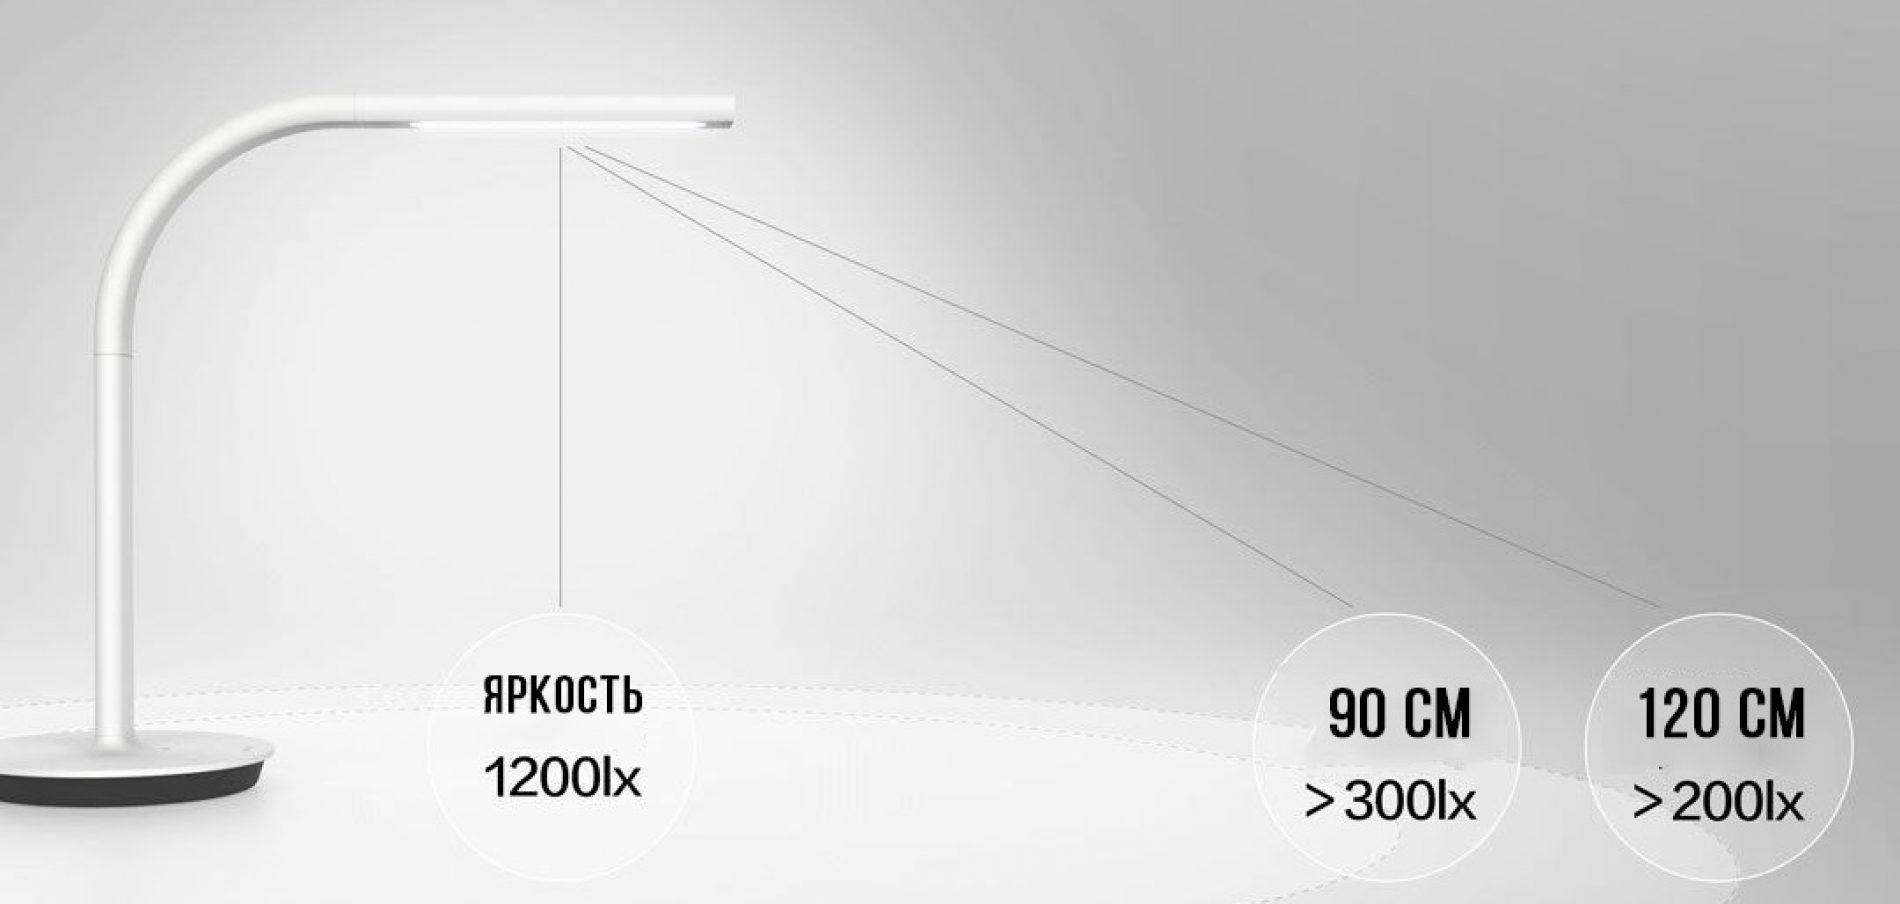 Картинки по запросу xiaomi philips eyecare smart lamp 2 купить